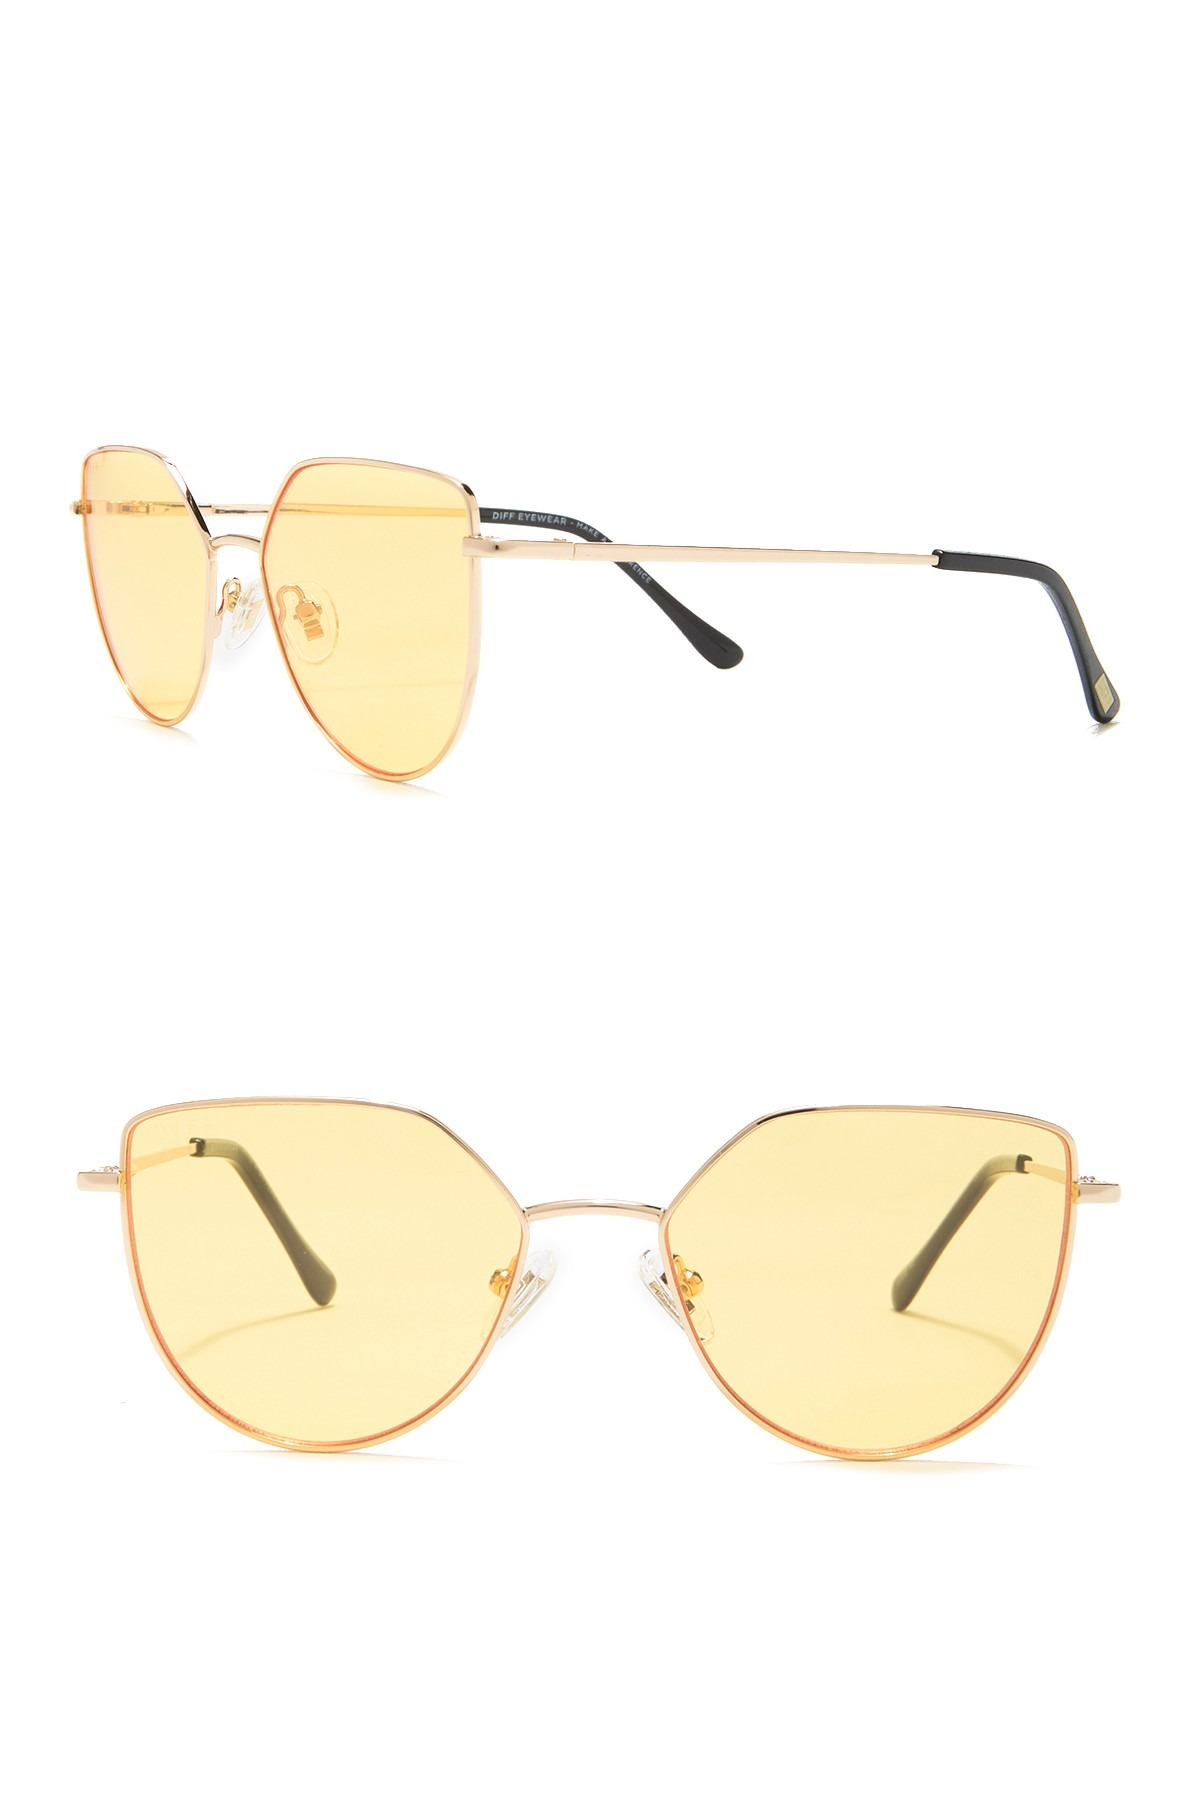 DIFF Eyewear Pixie XL 53mm Sunglasses